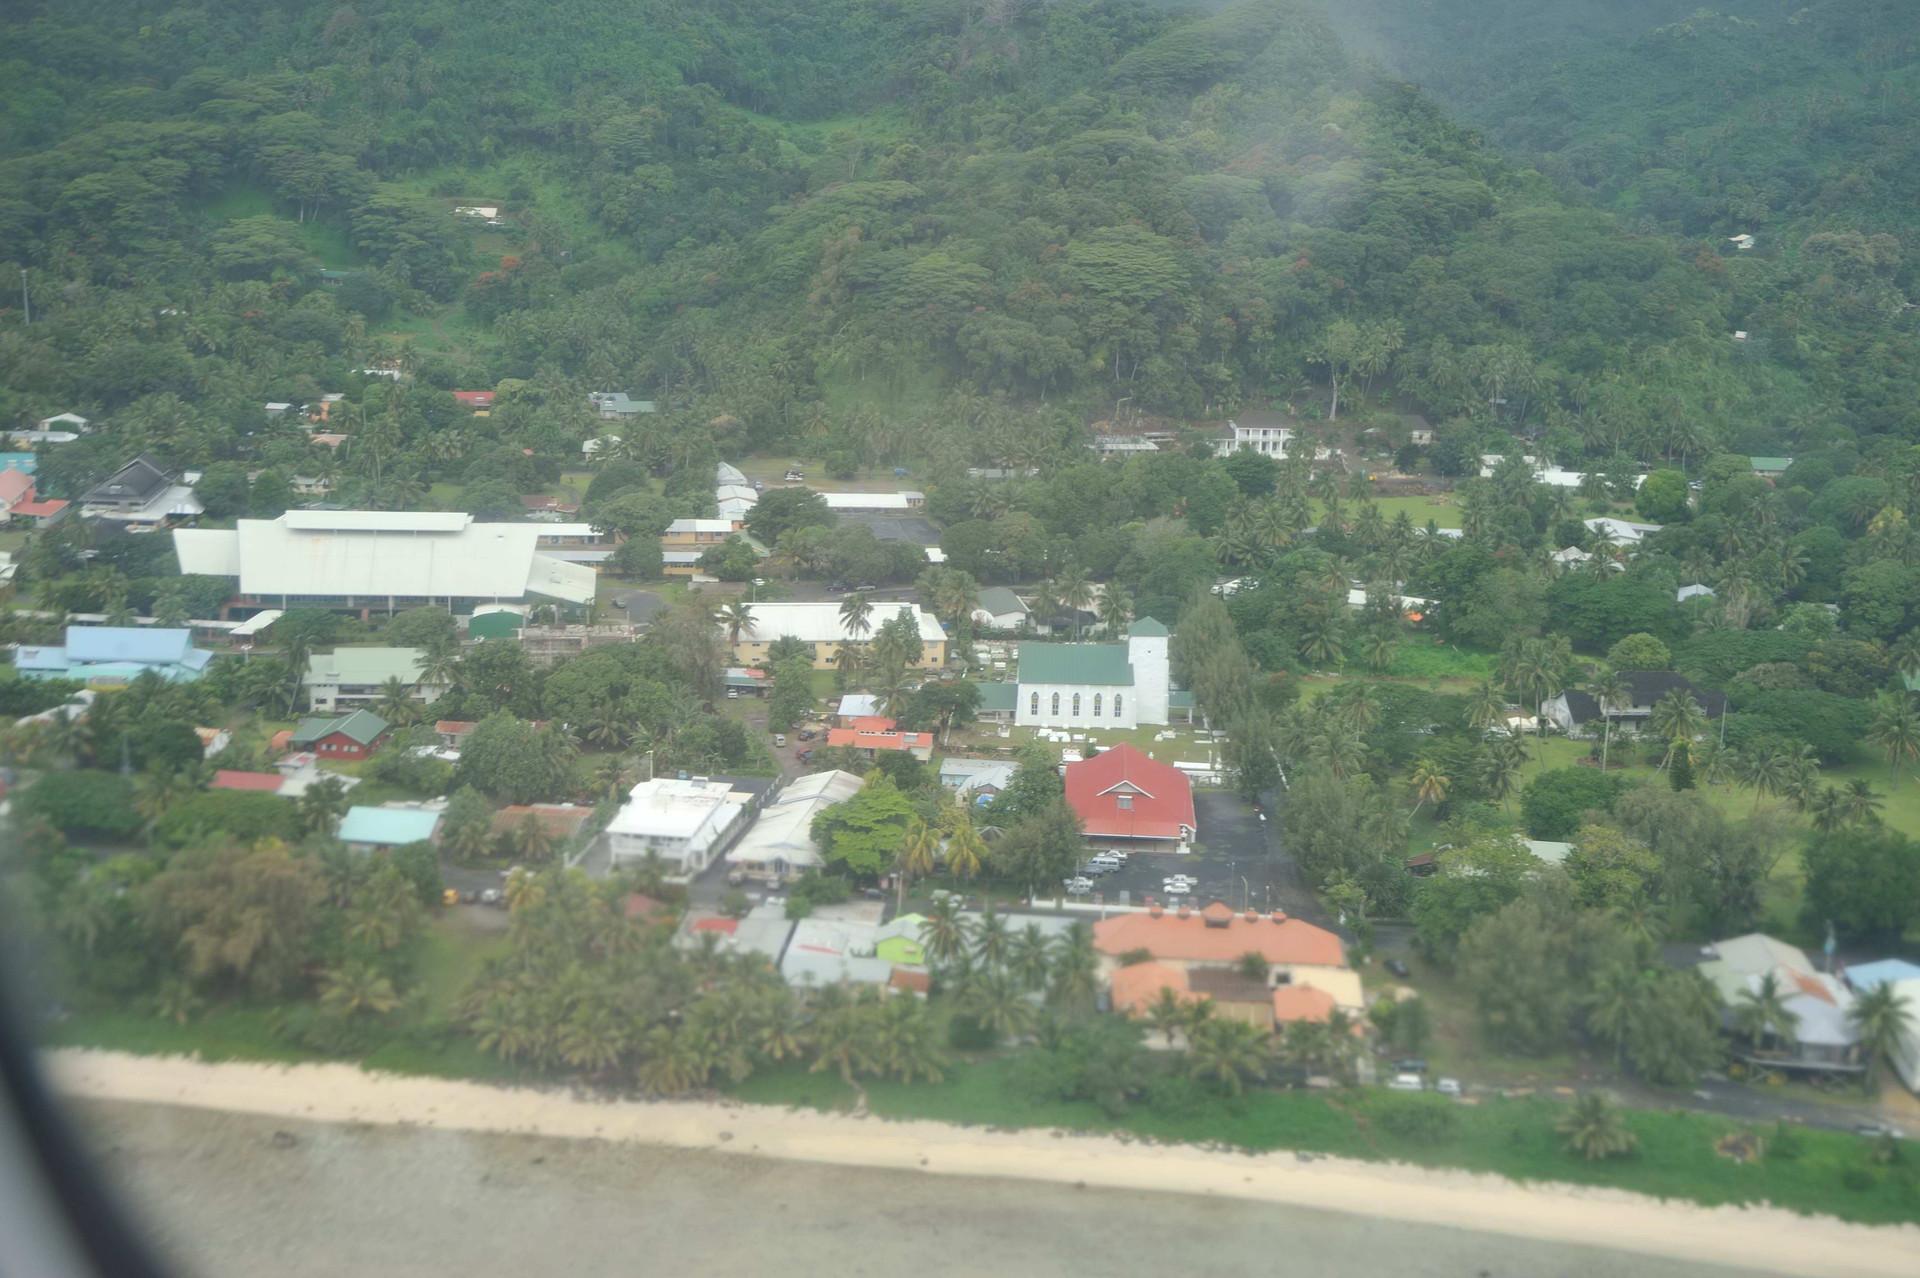 Cook Island Christian Church from the air